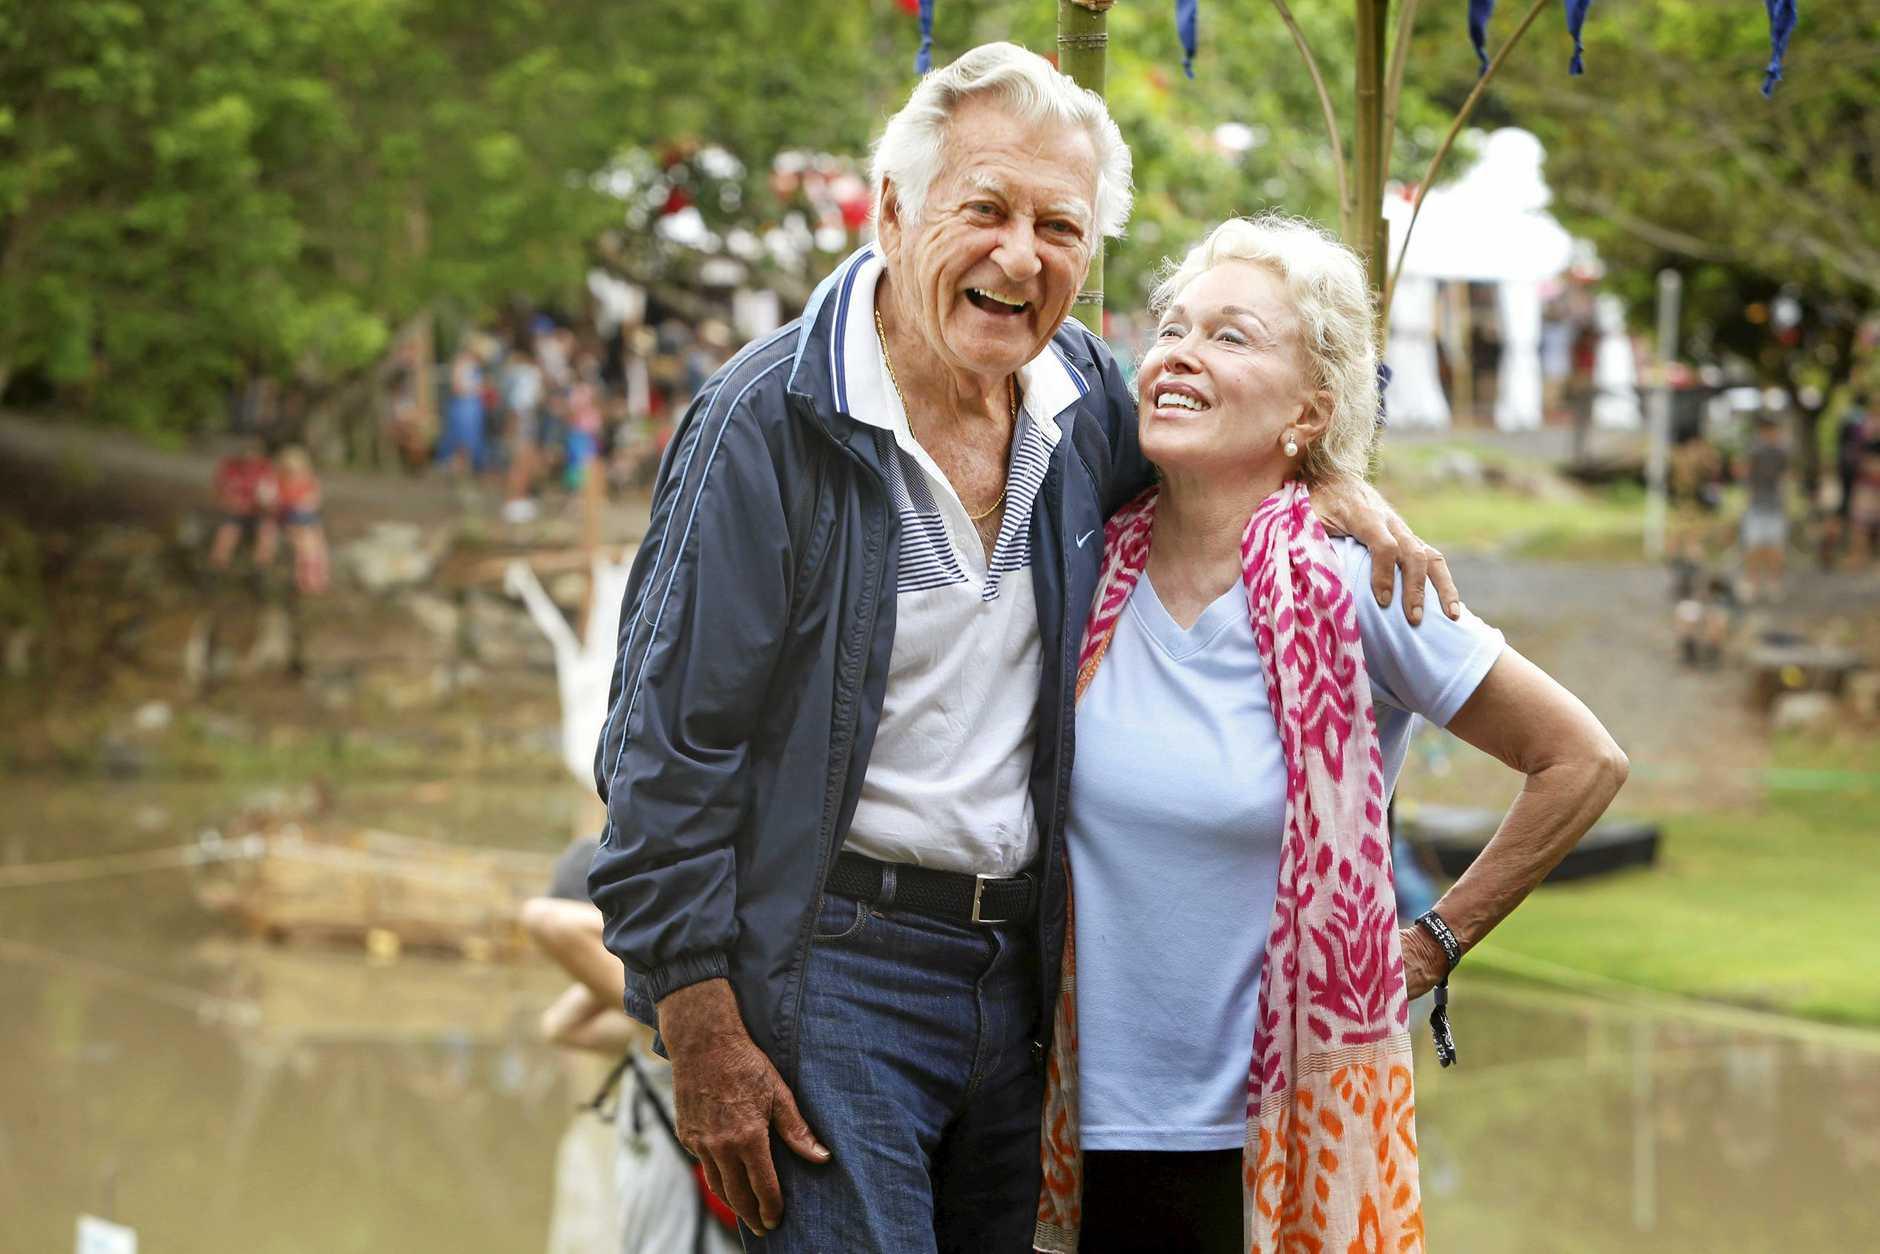 Bob Hawke and wife Blanche d'Alpuget at Woodford folk festival. Pic Megan Slade